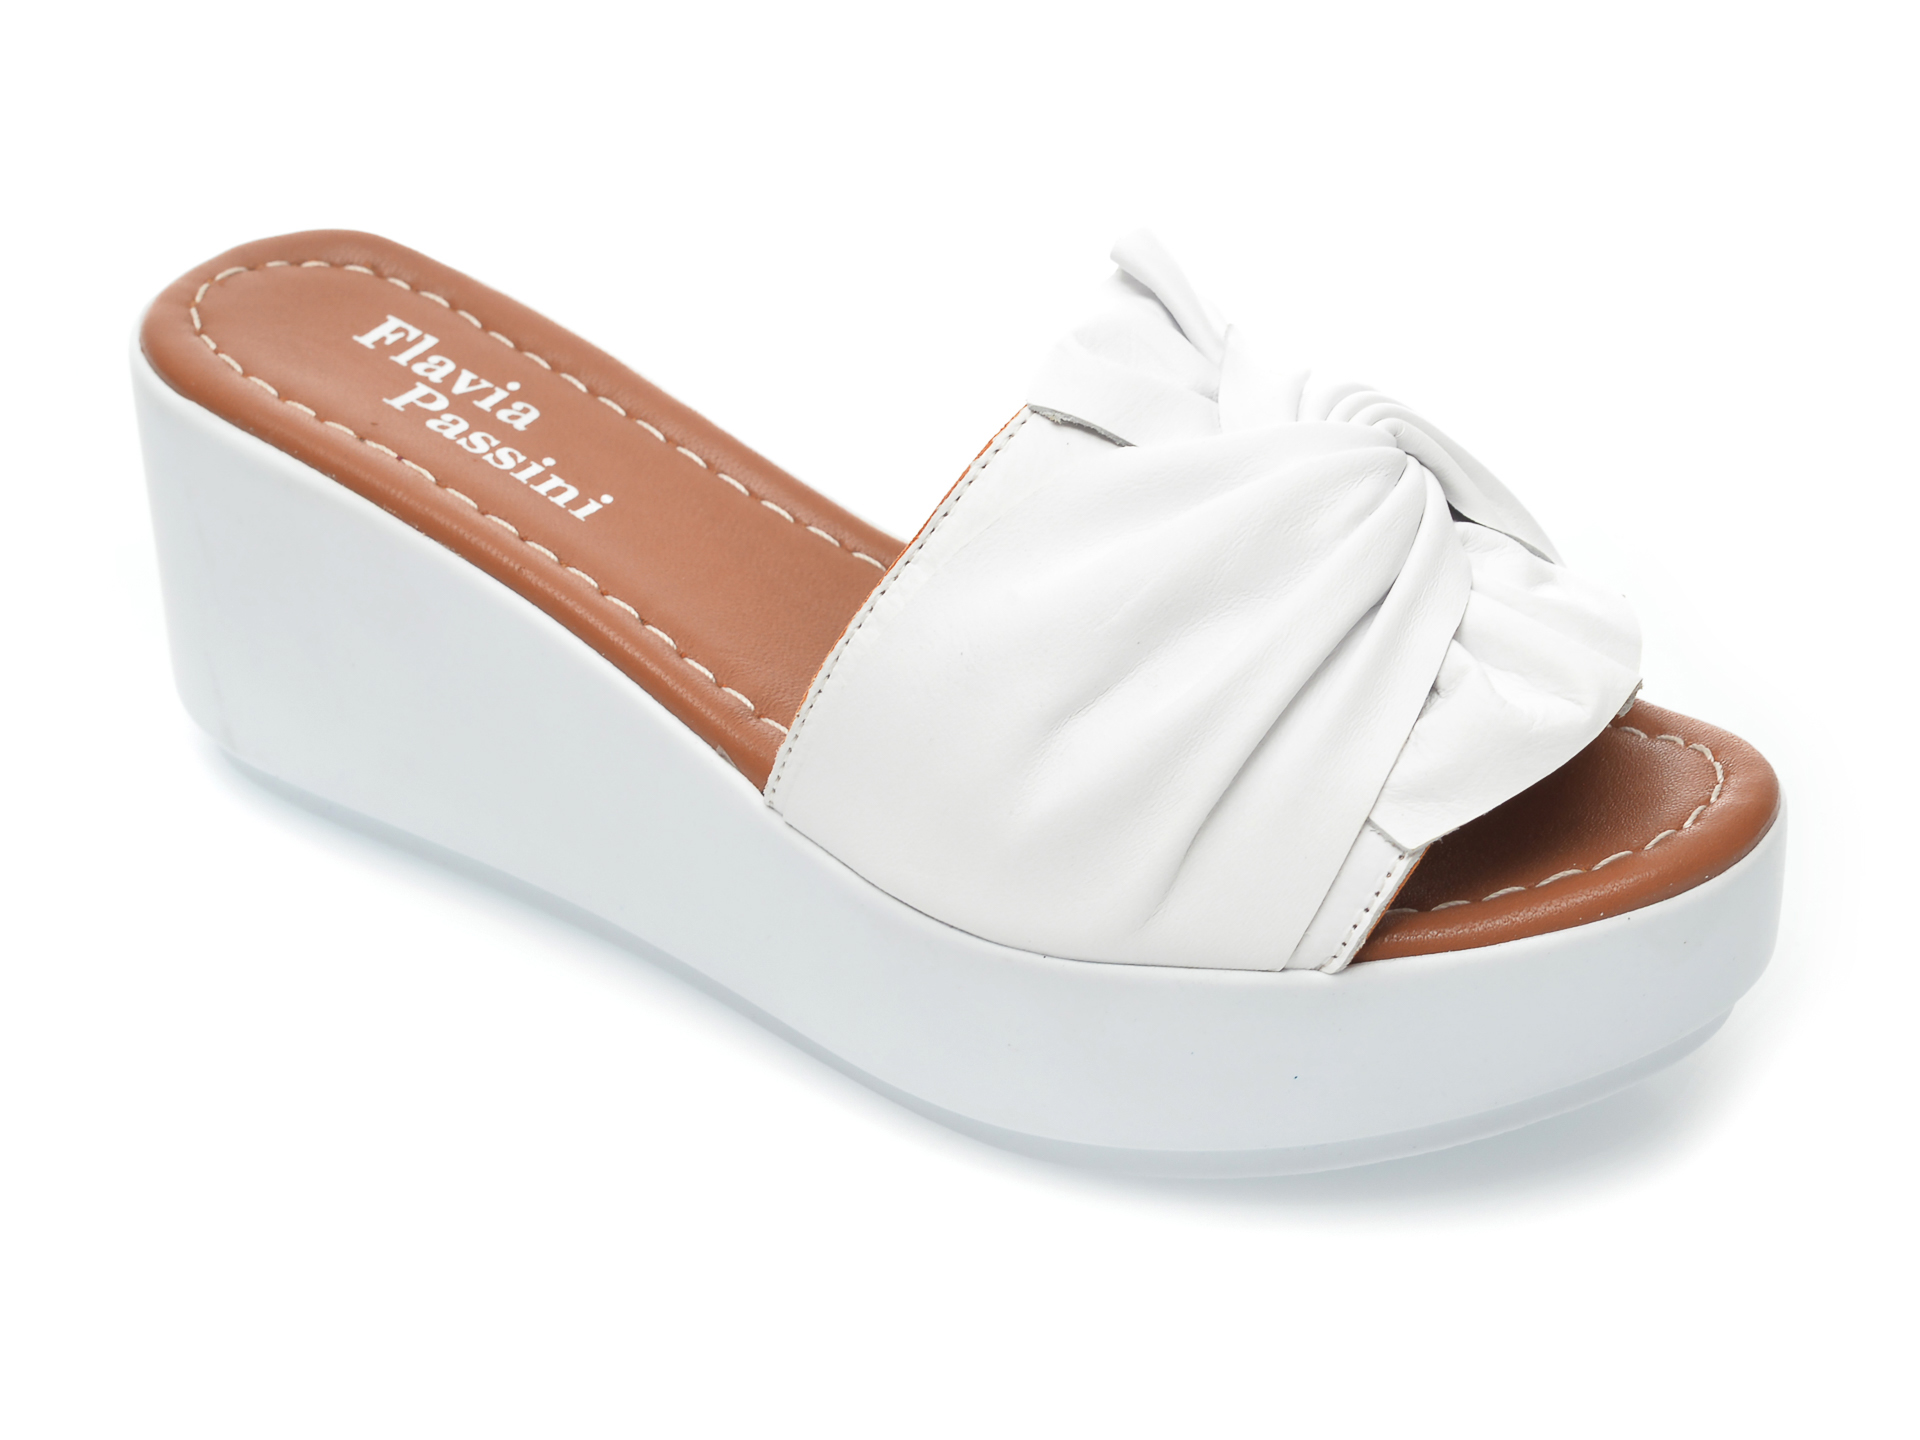 Papuci FLAVIA PASSINI albi, 810, din piele naturala imagine otter.ro